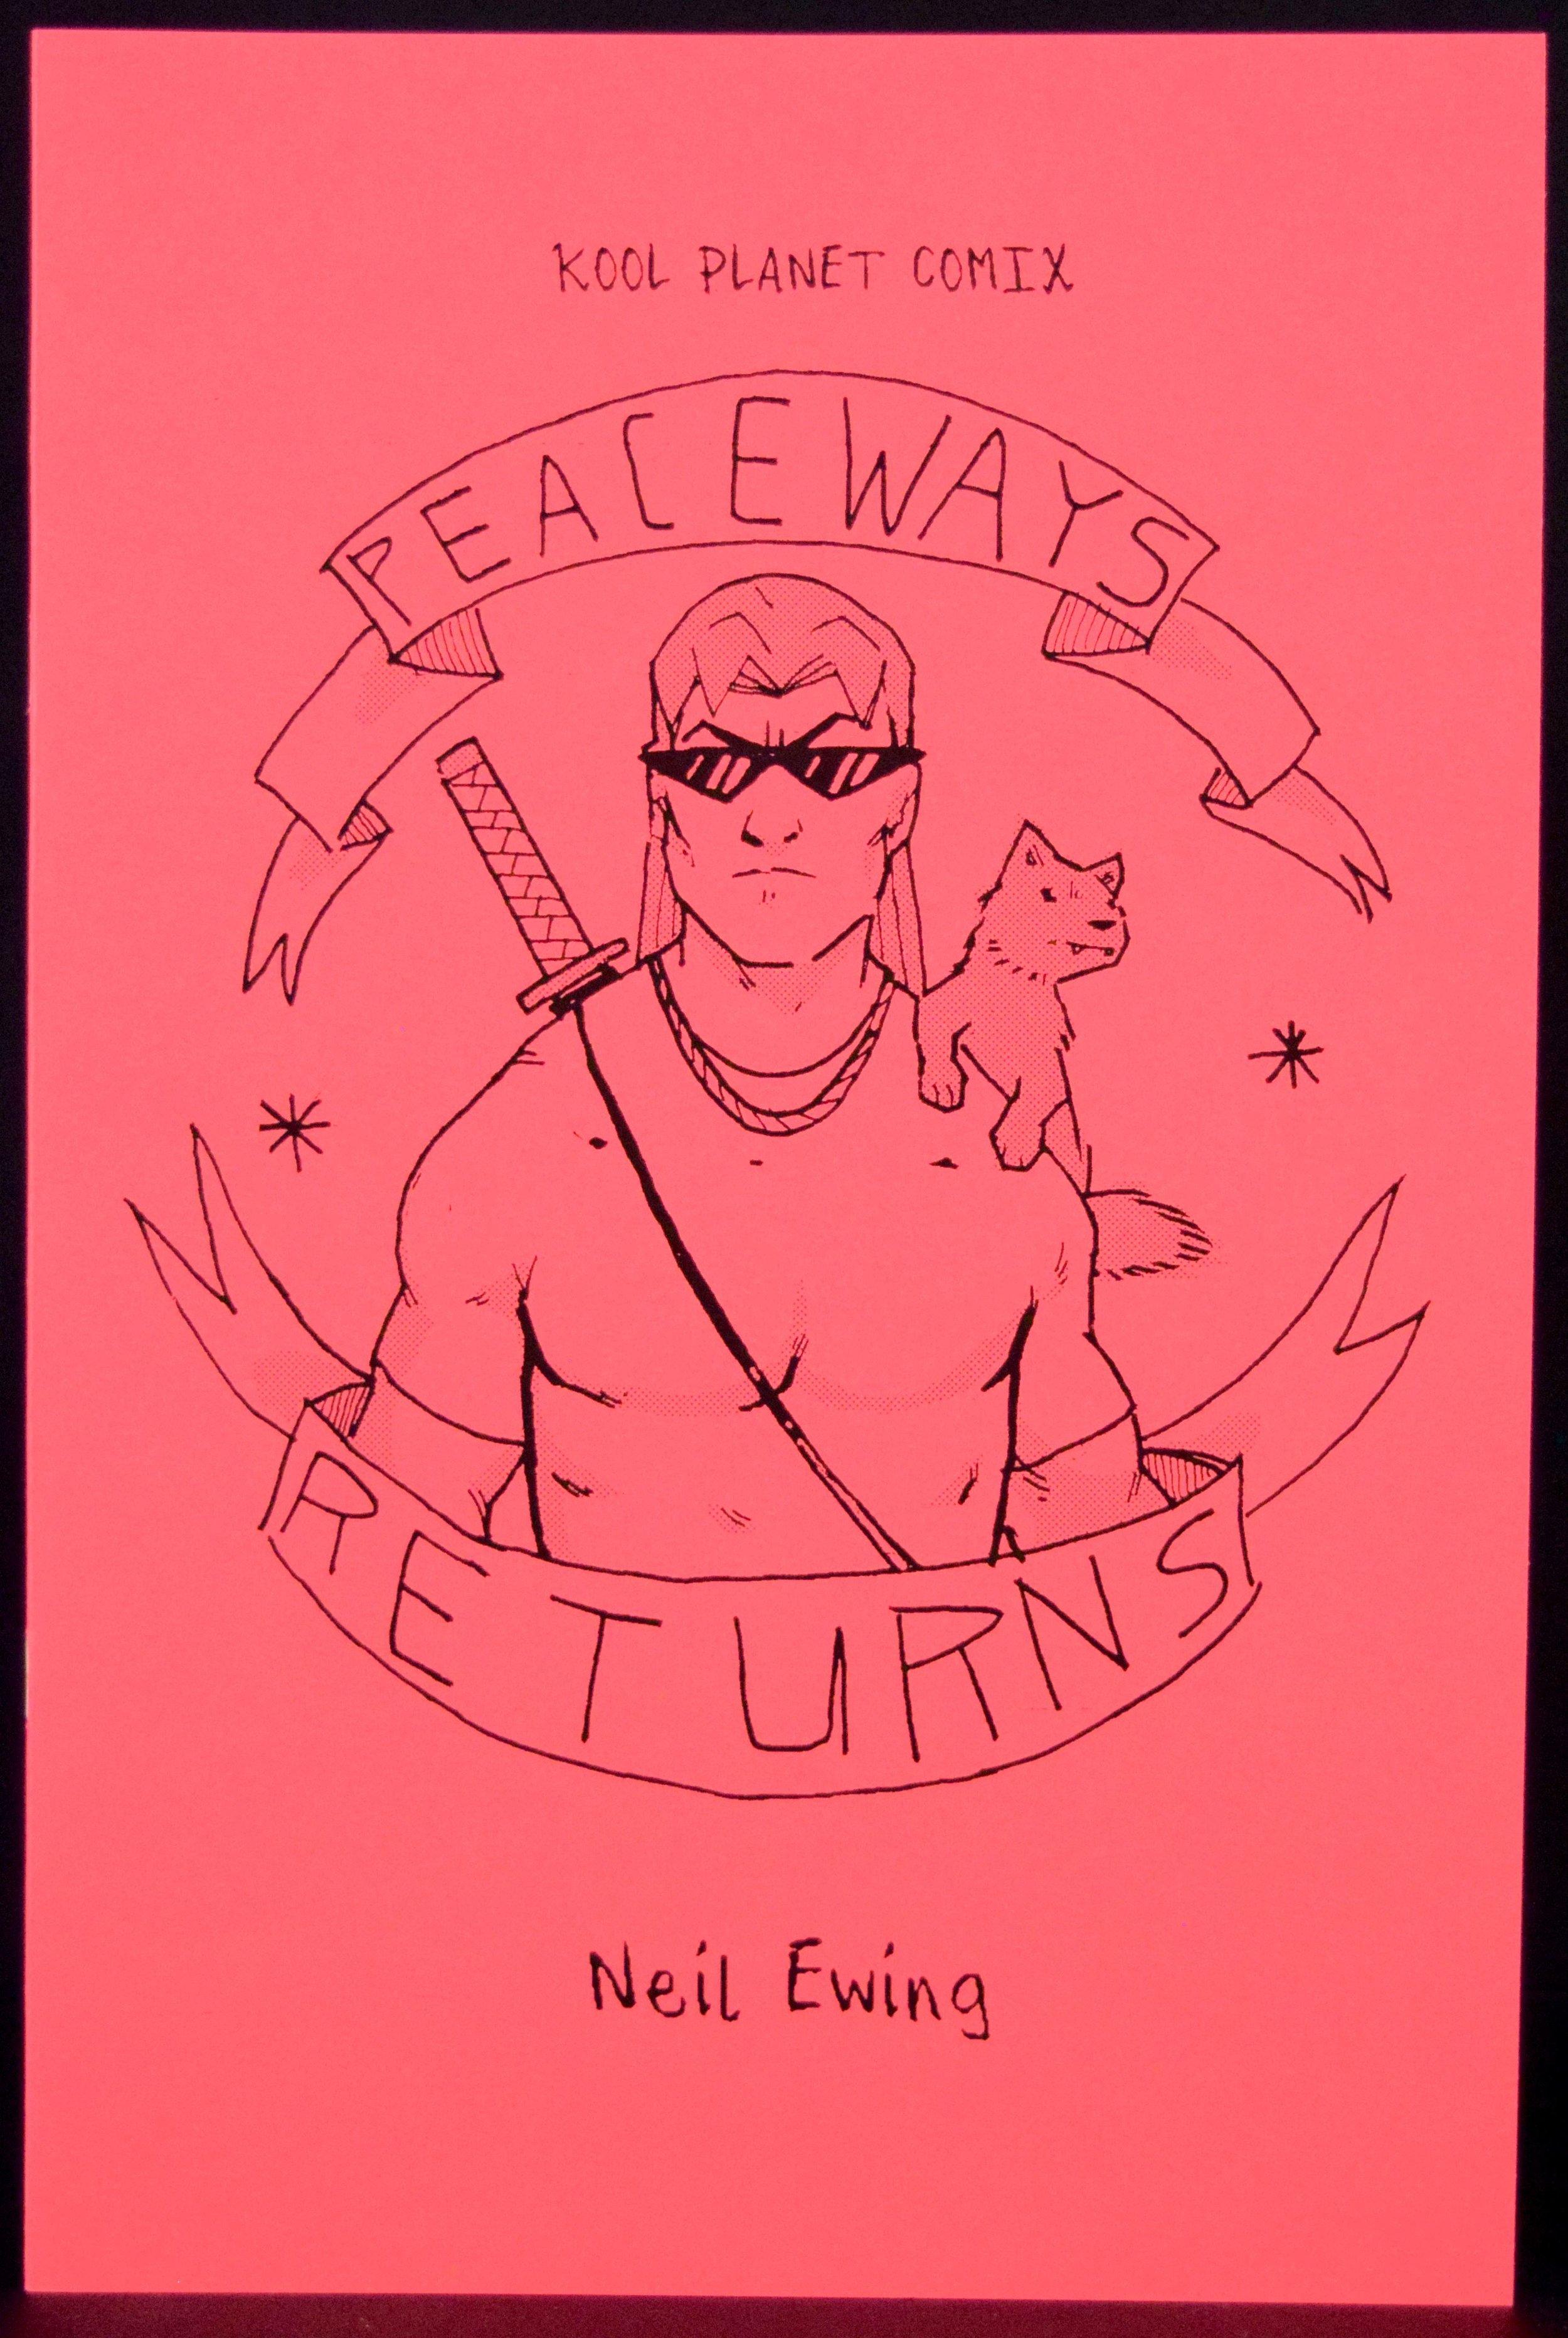 Peaceways Returns  by  Neil Ewing .